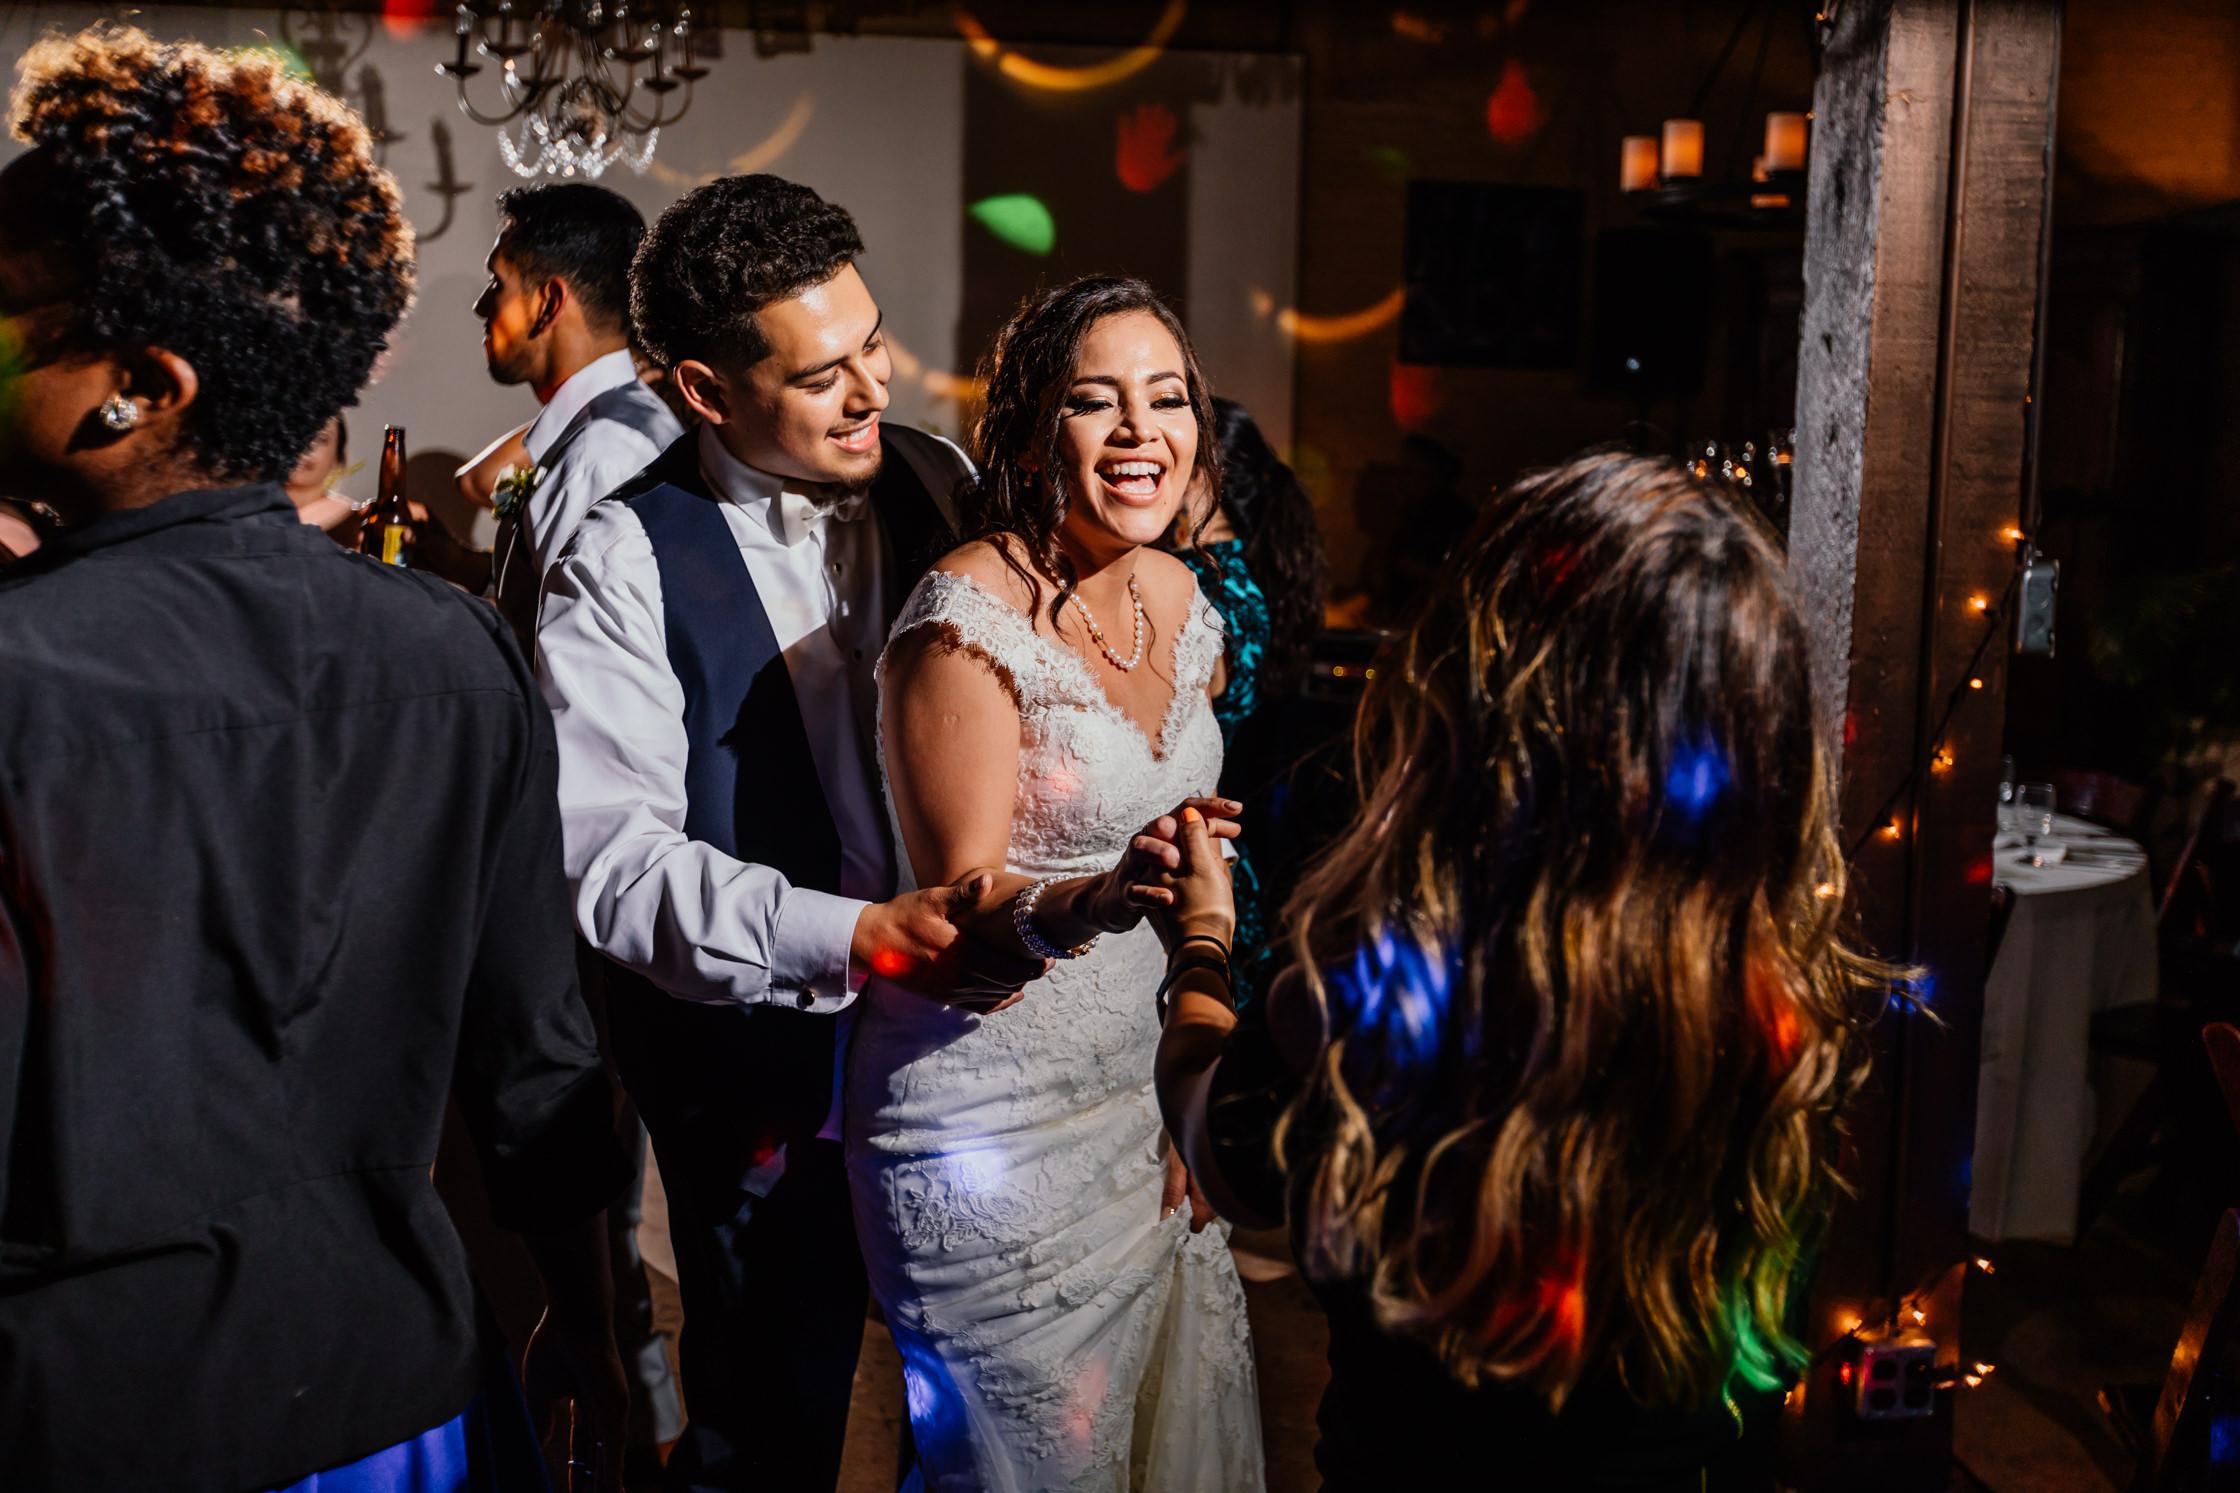 luis_joanna_wedding-132.jpg